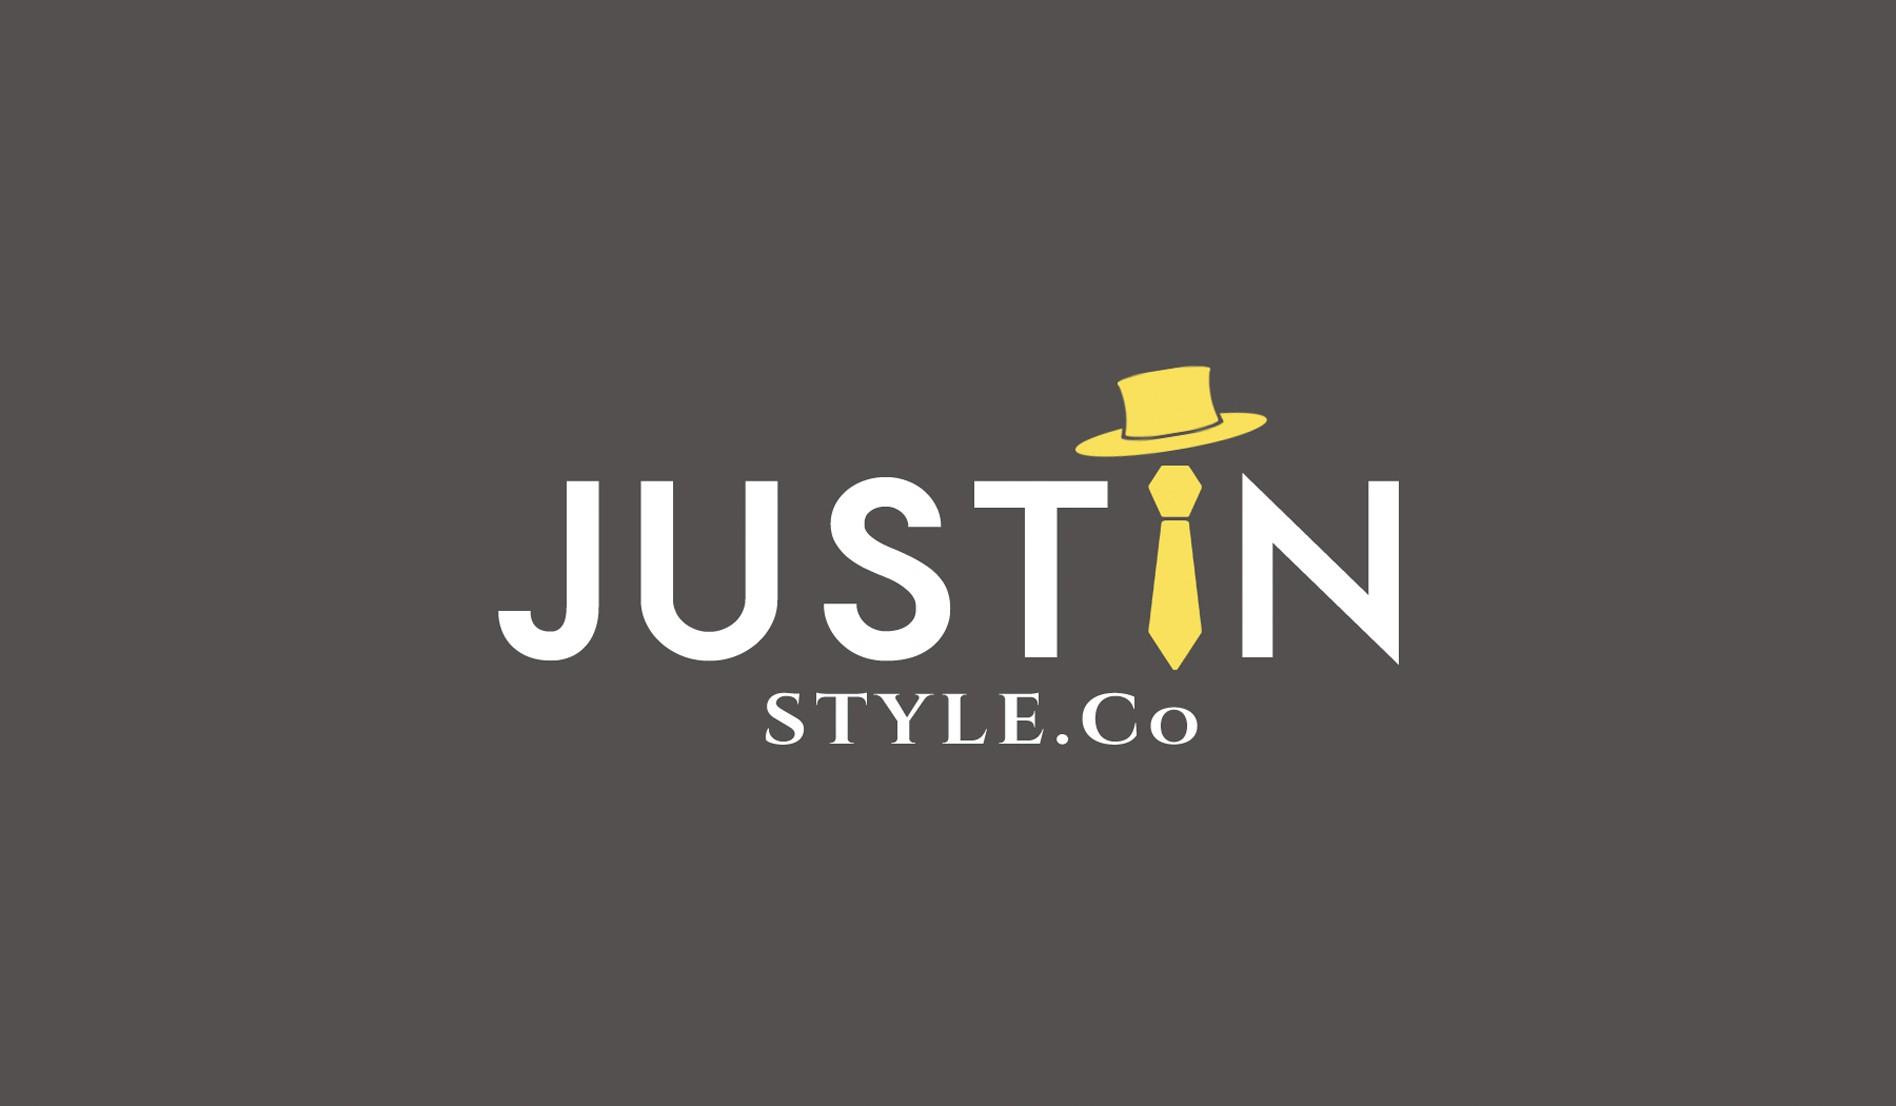 ><><>Modern, Sophisticated, Sleek Logo for Men's Apparel & Accessories Retailer JustInStyle.co<><><